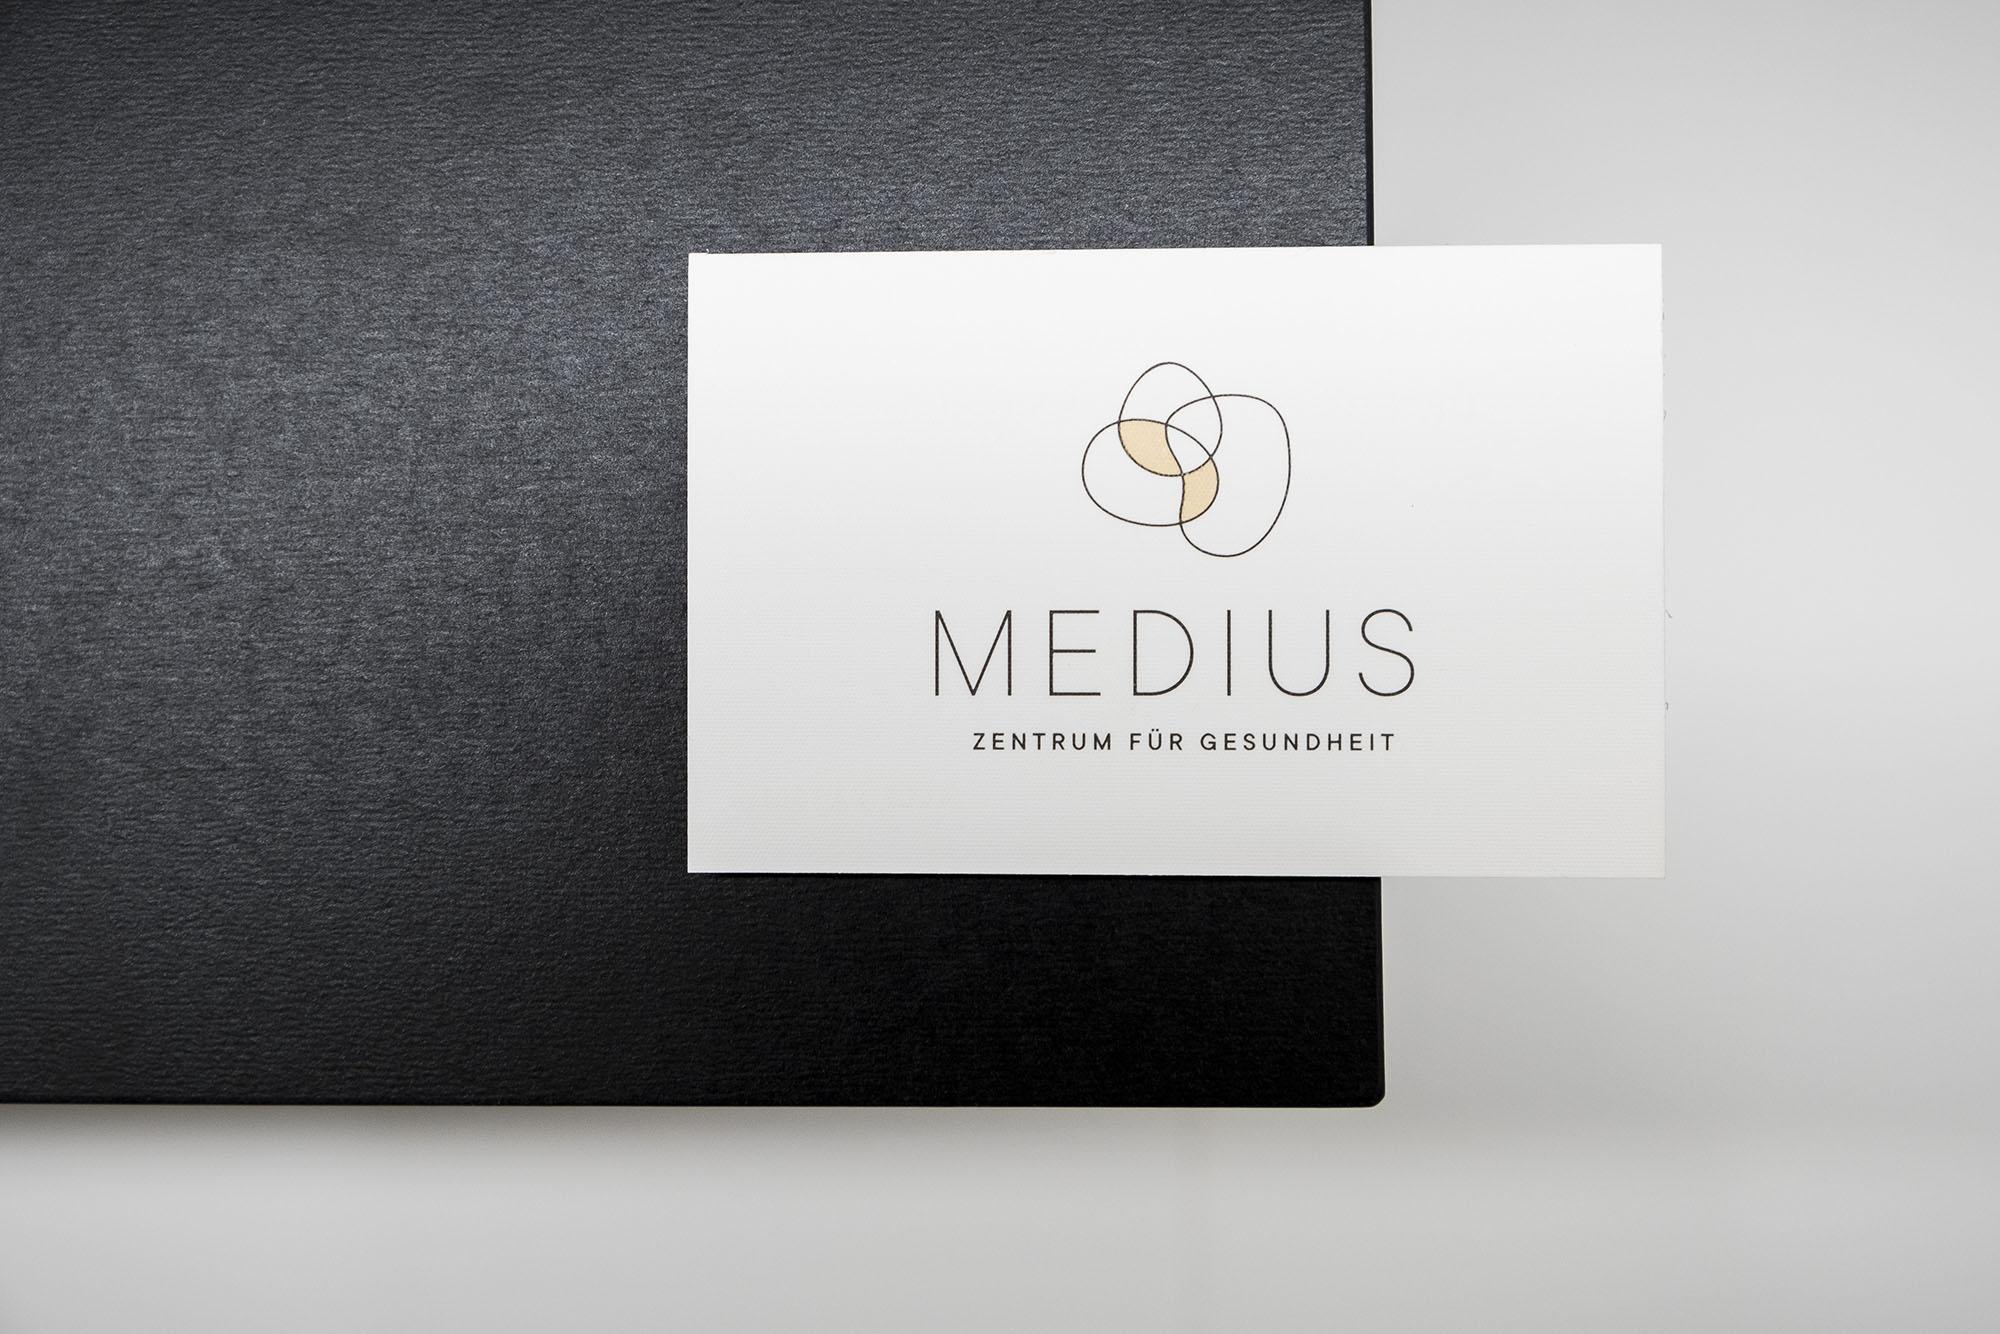 049_Medius_DSF7084